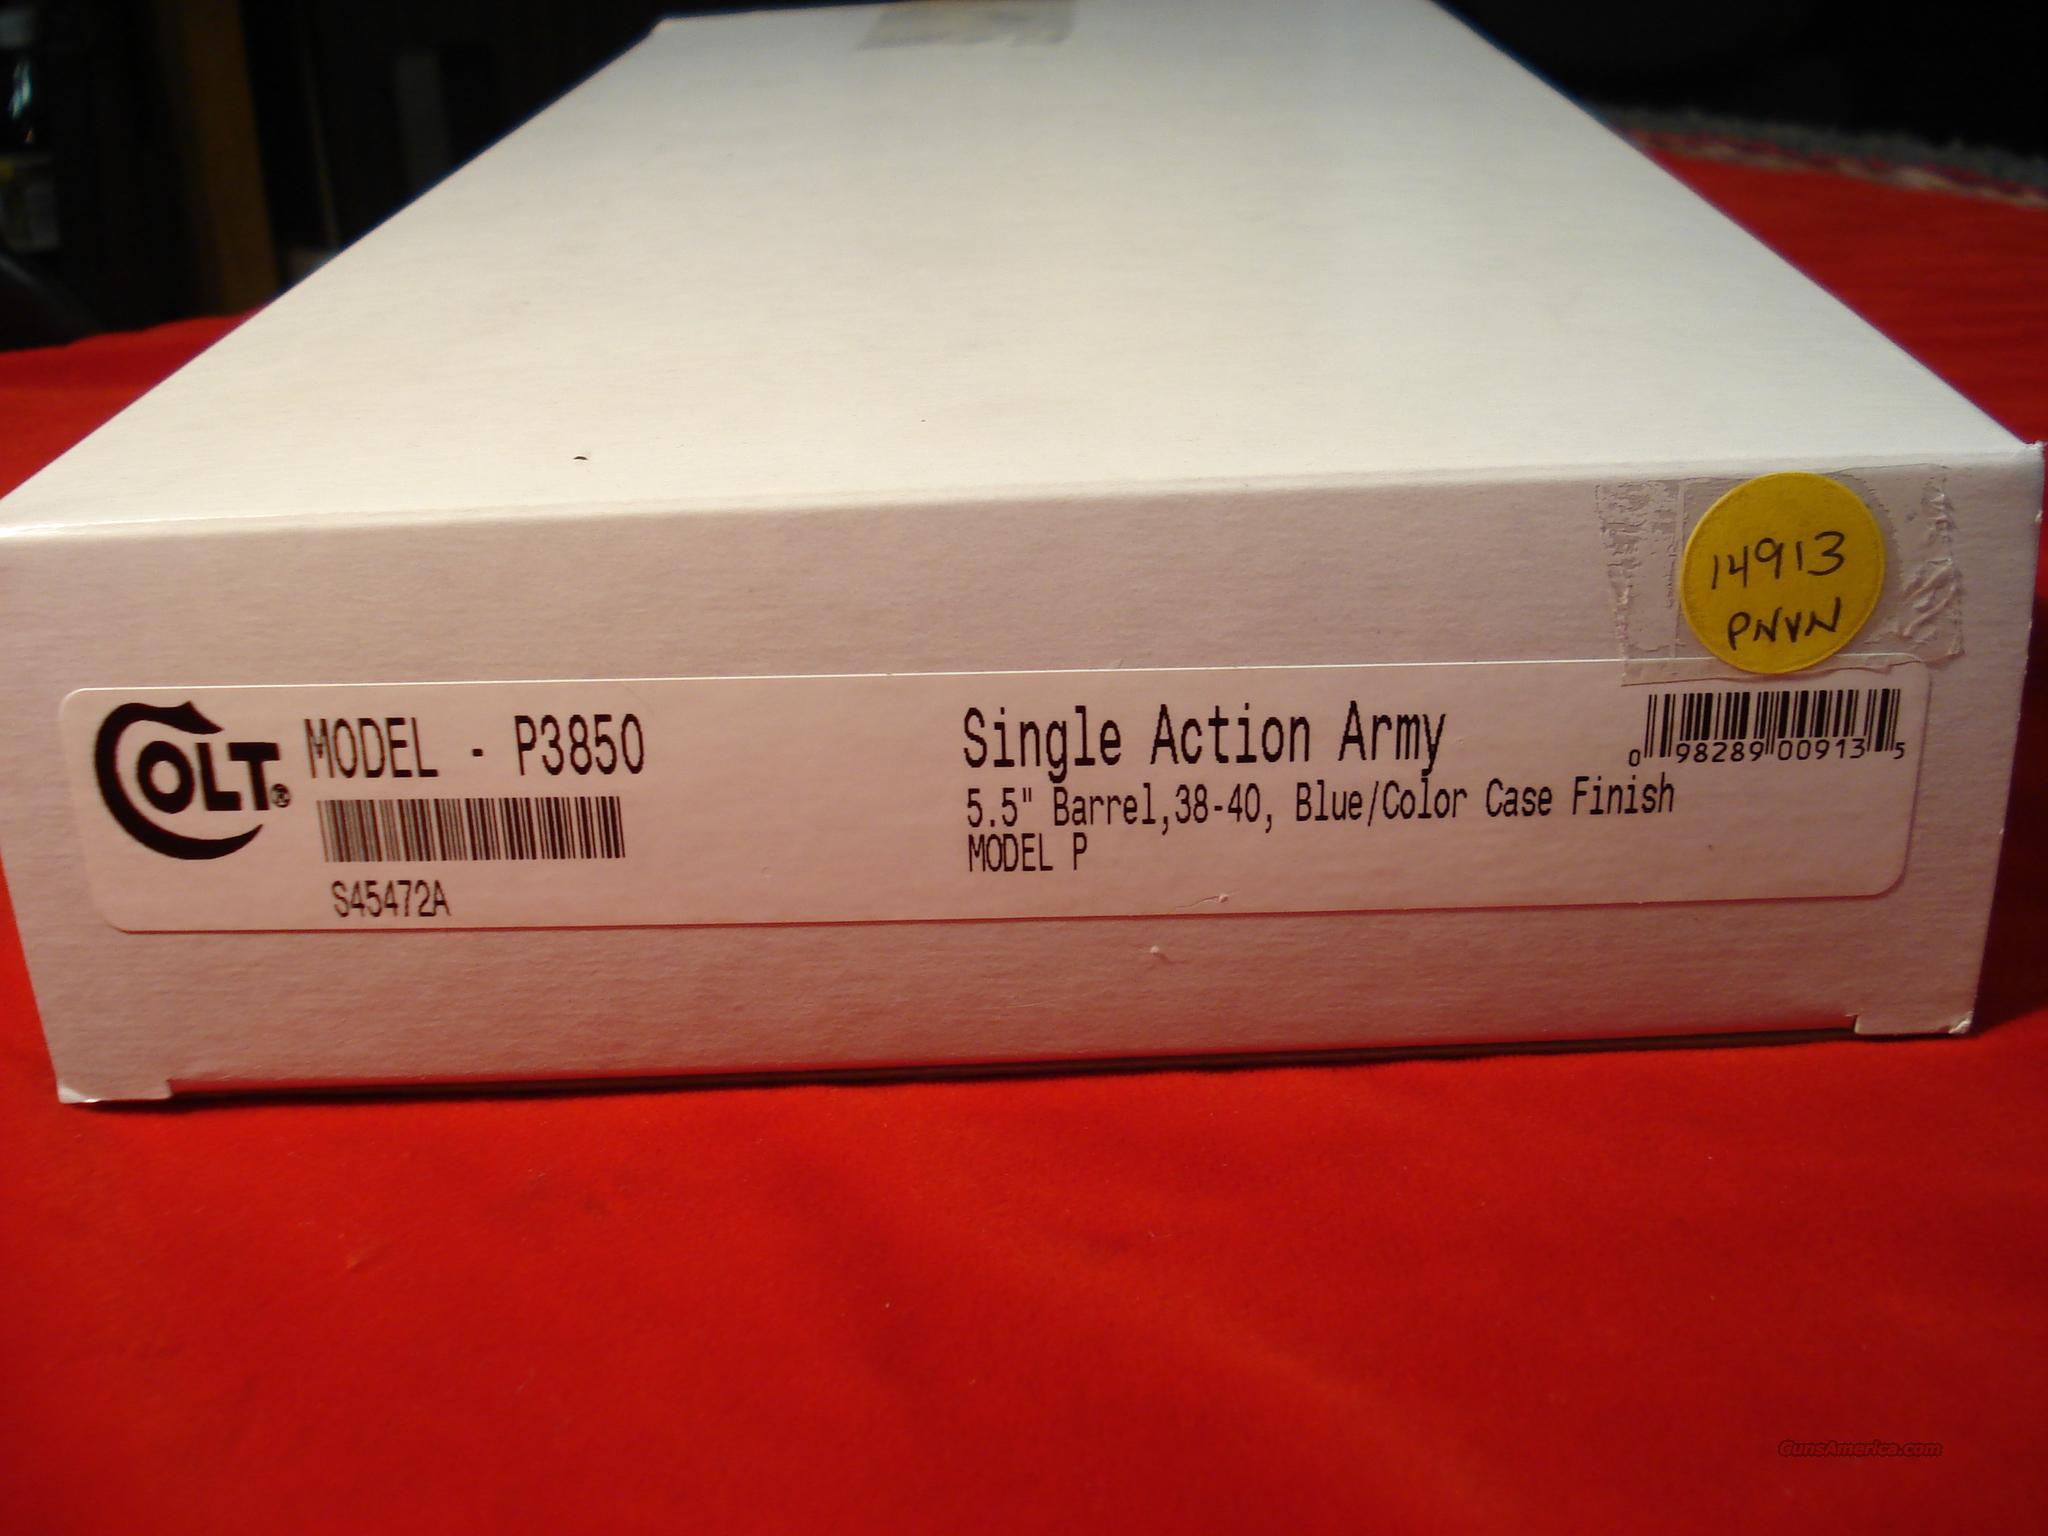 COLT NEW SINGLE ACTION ARMY 38-40CAL. 5 1/2 COLOR CASE FINISH  Guns > Pistols > Colt Single Action Revolvers - 3rd Gen.